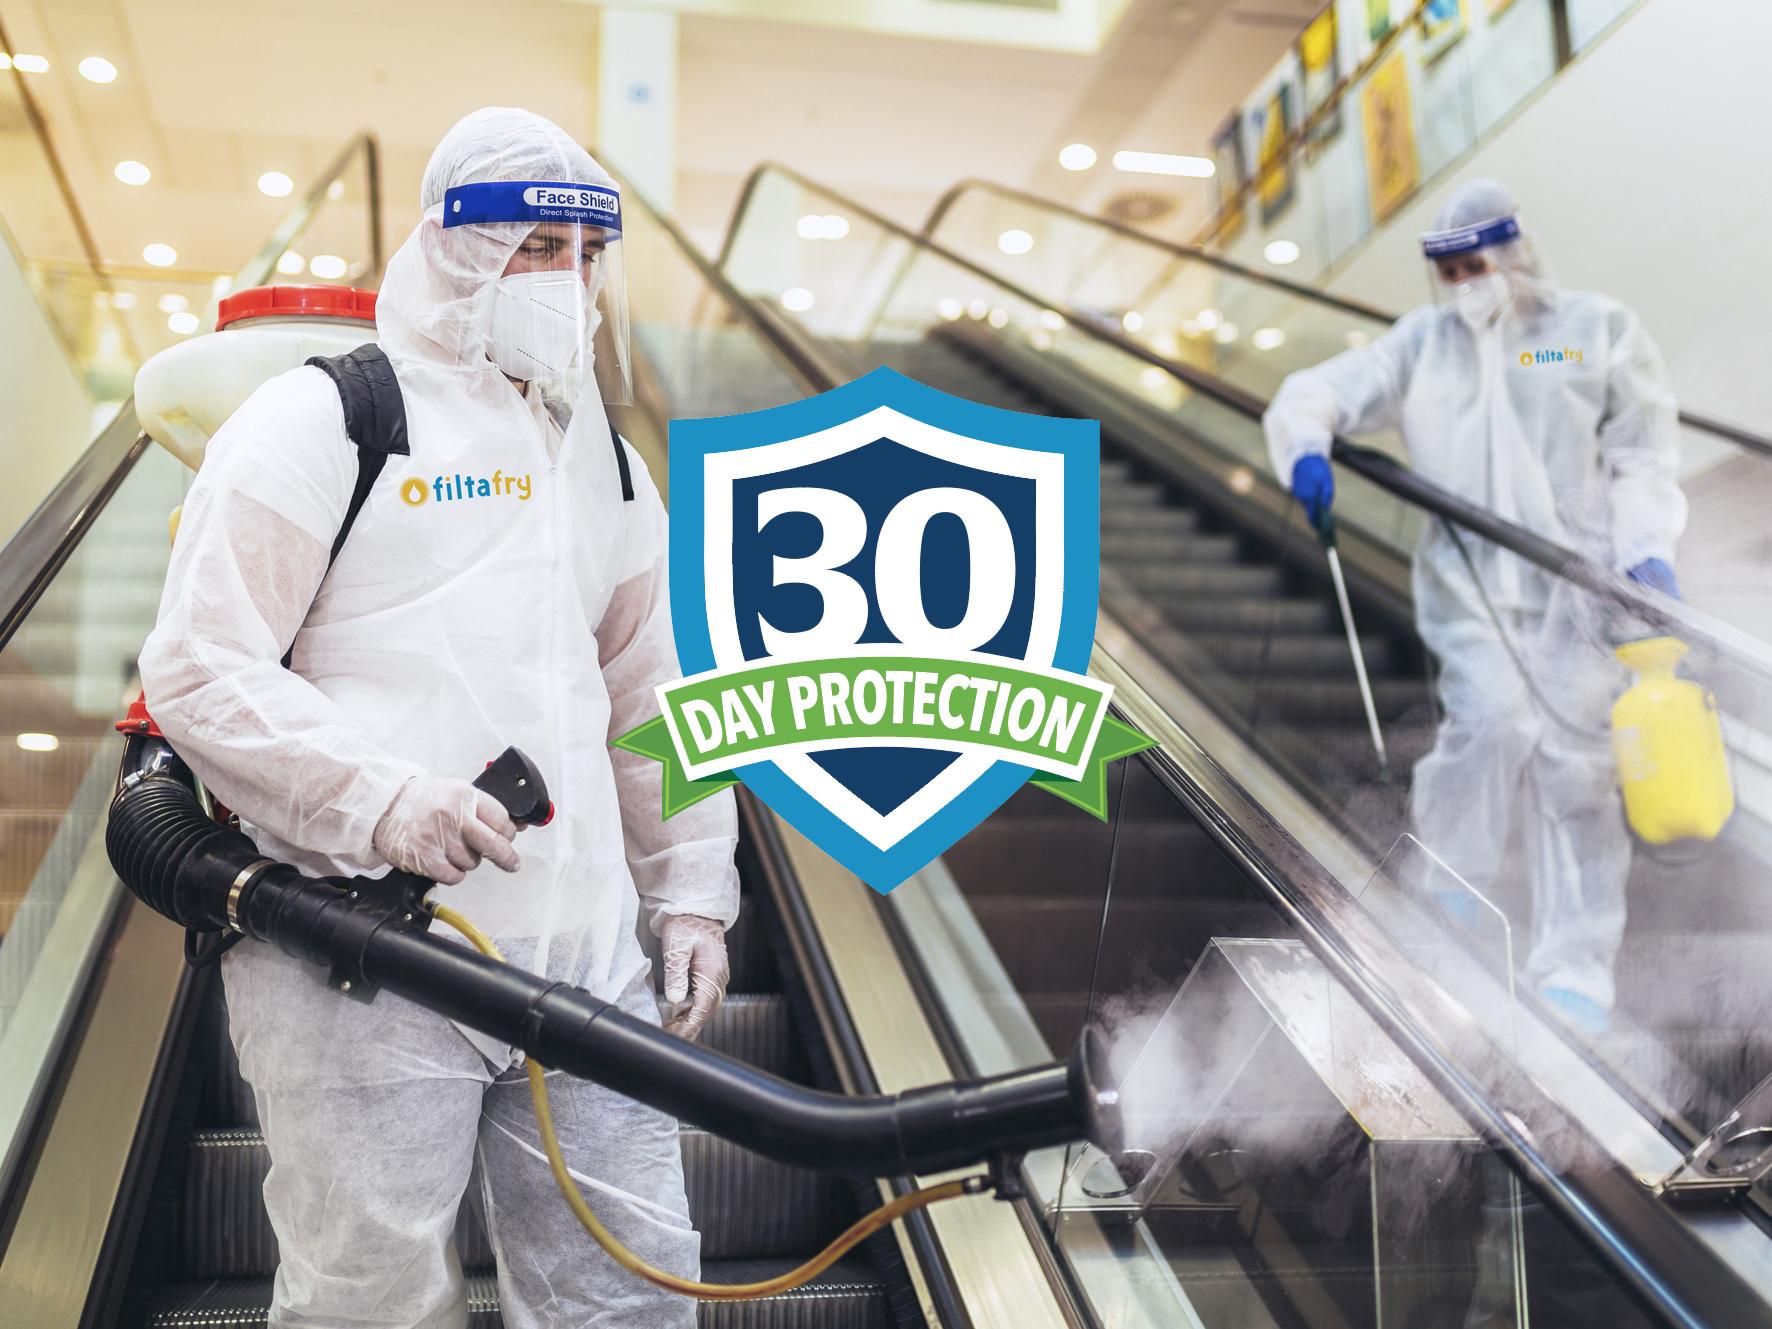 Desinfektion ohne Chemie: Franchisesystem Filtafry erweitert Angebot